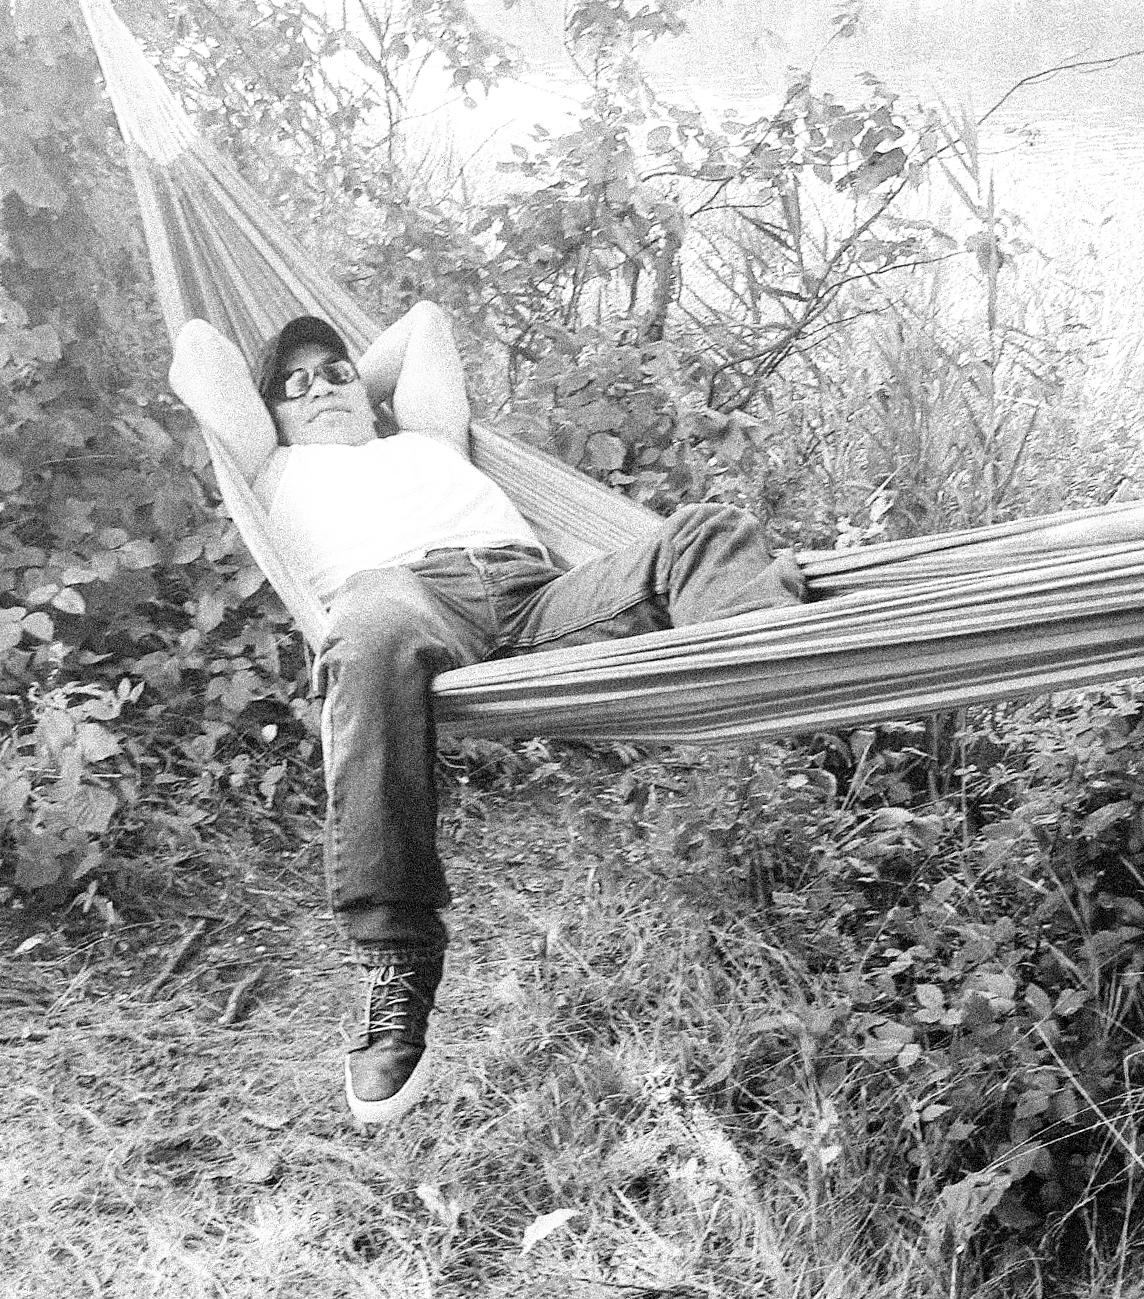 Antonio in hammock (I edited photo found on FB)